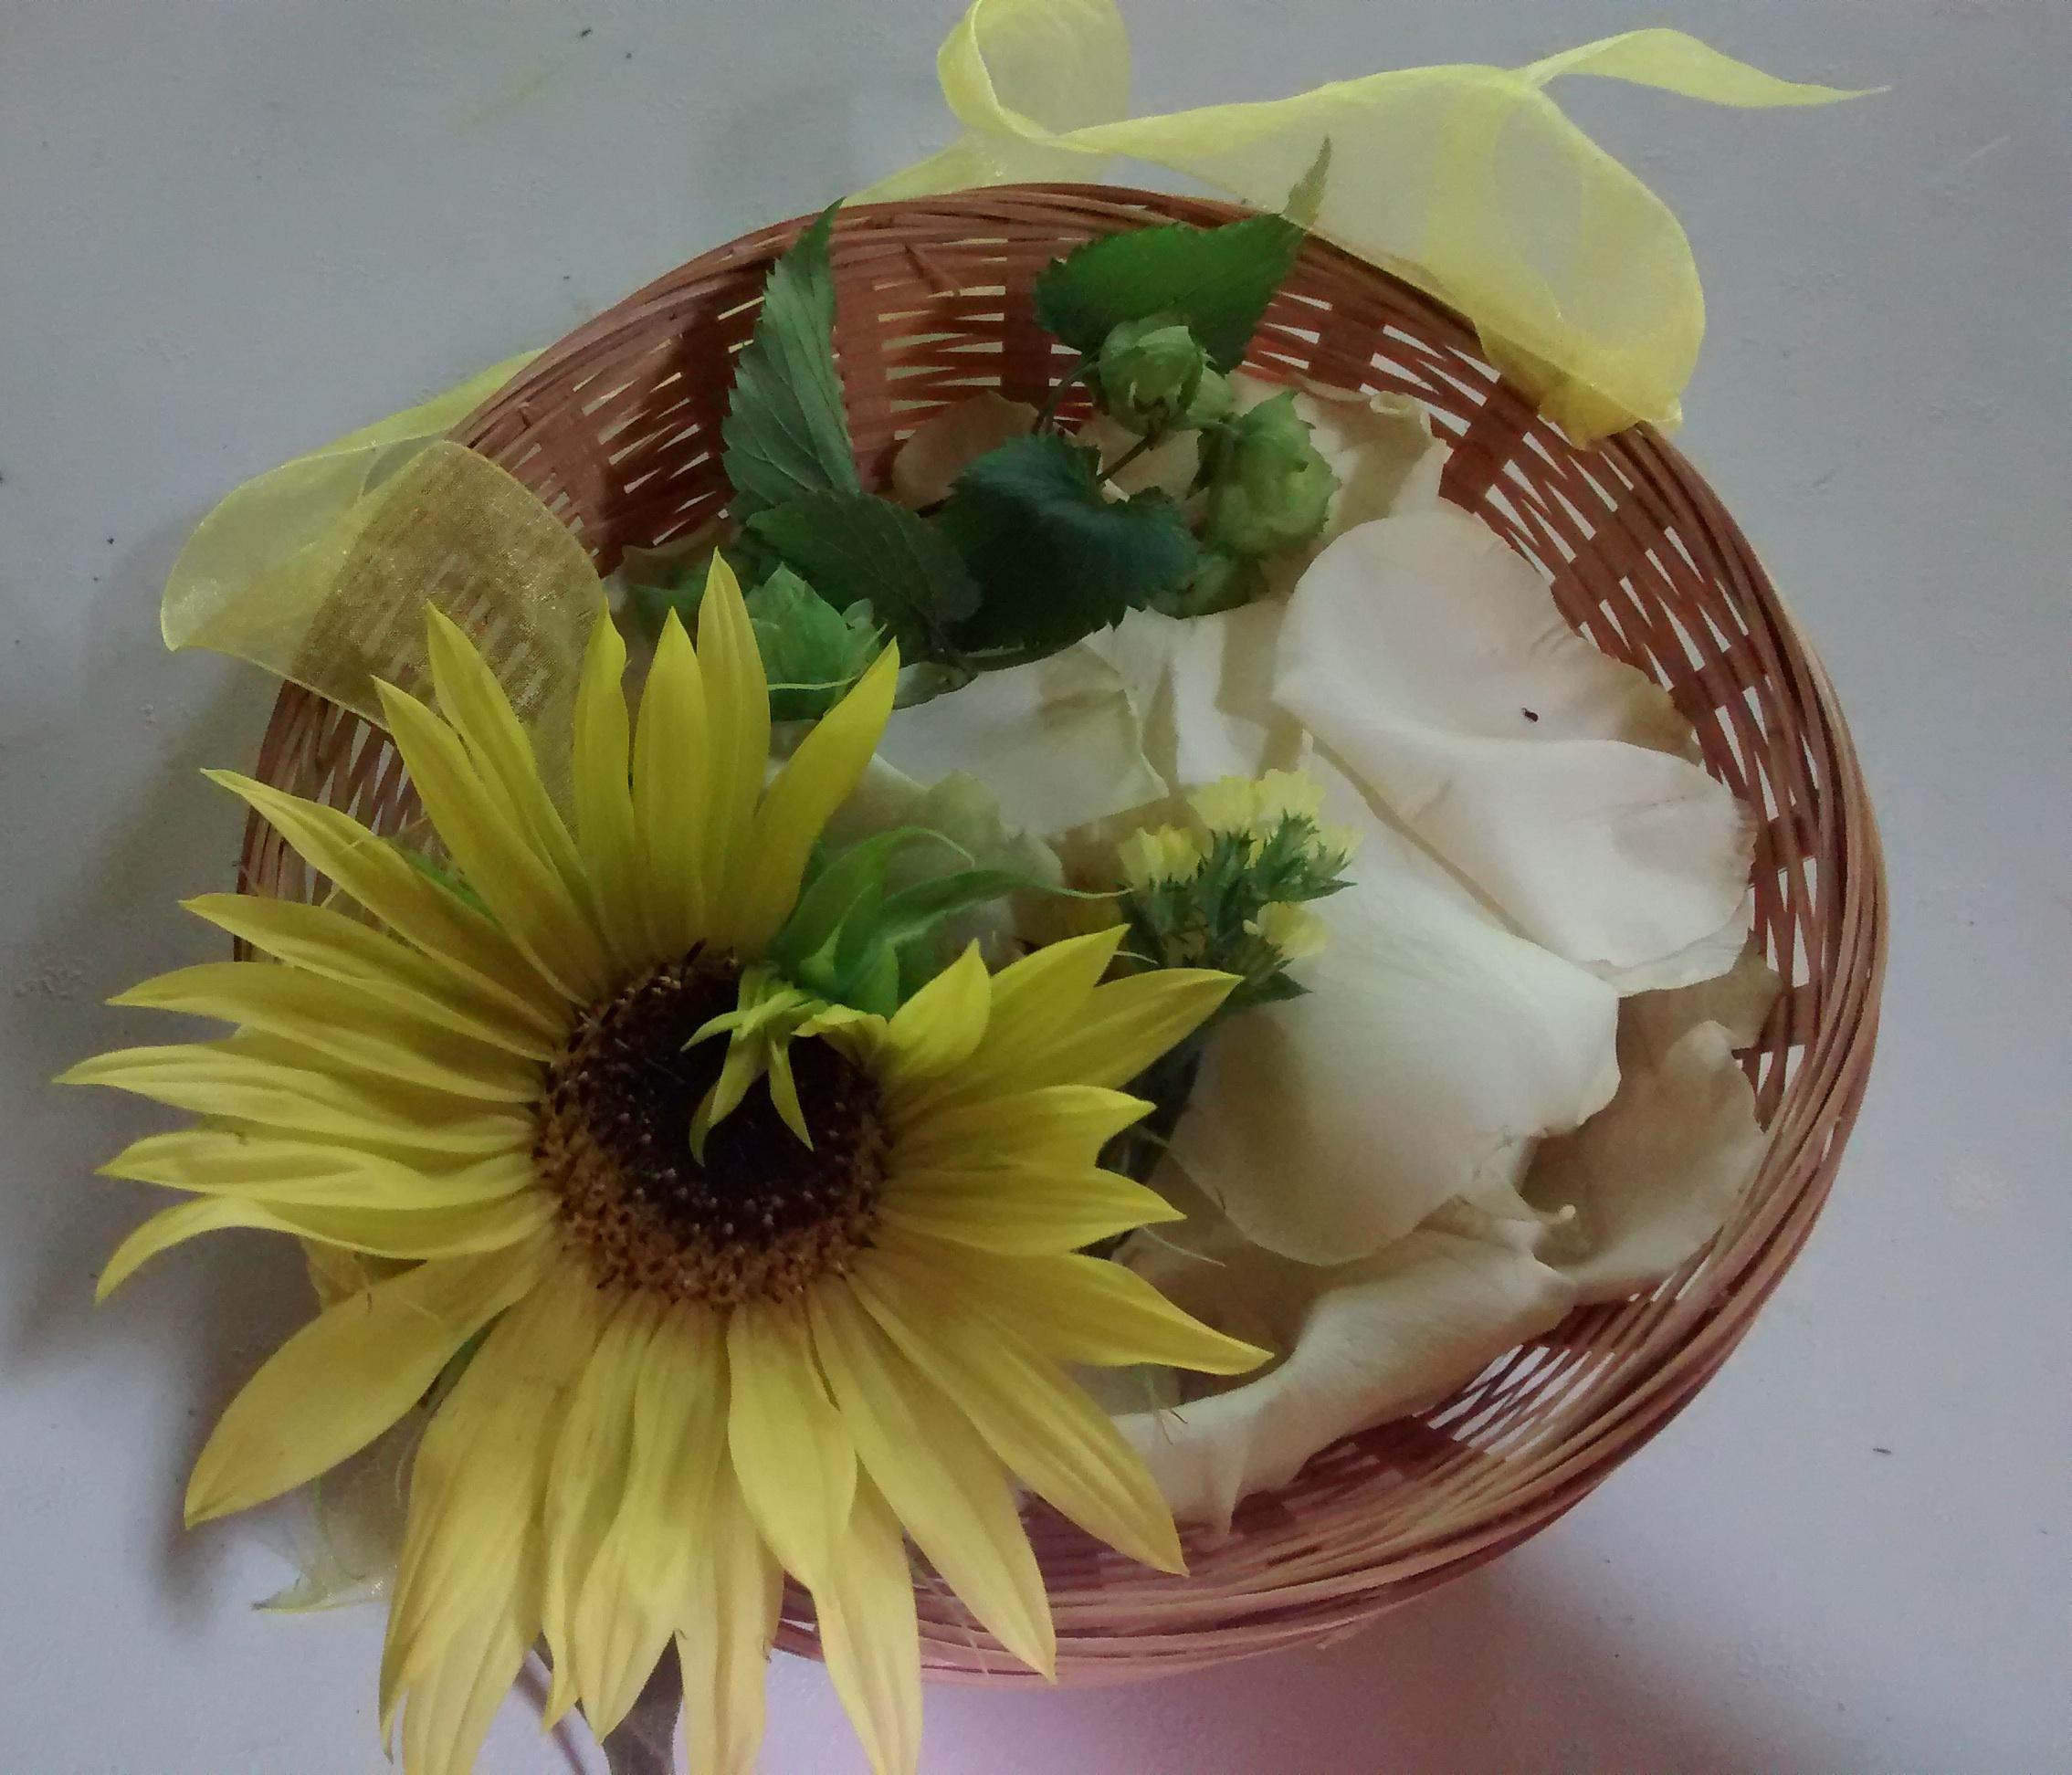 Flower girl basket - hops, rose petals, sunflower